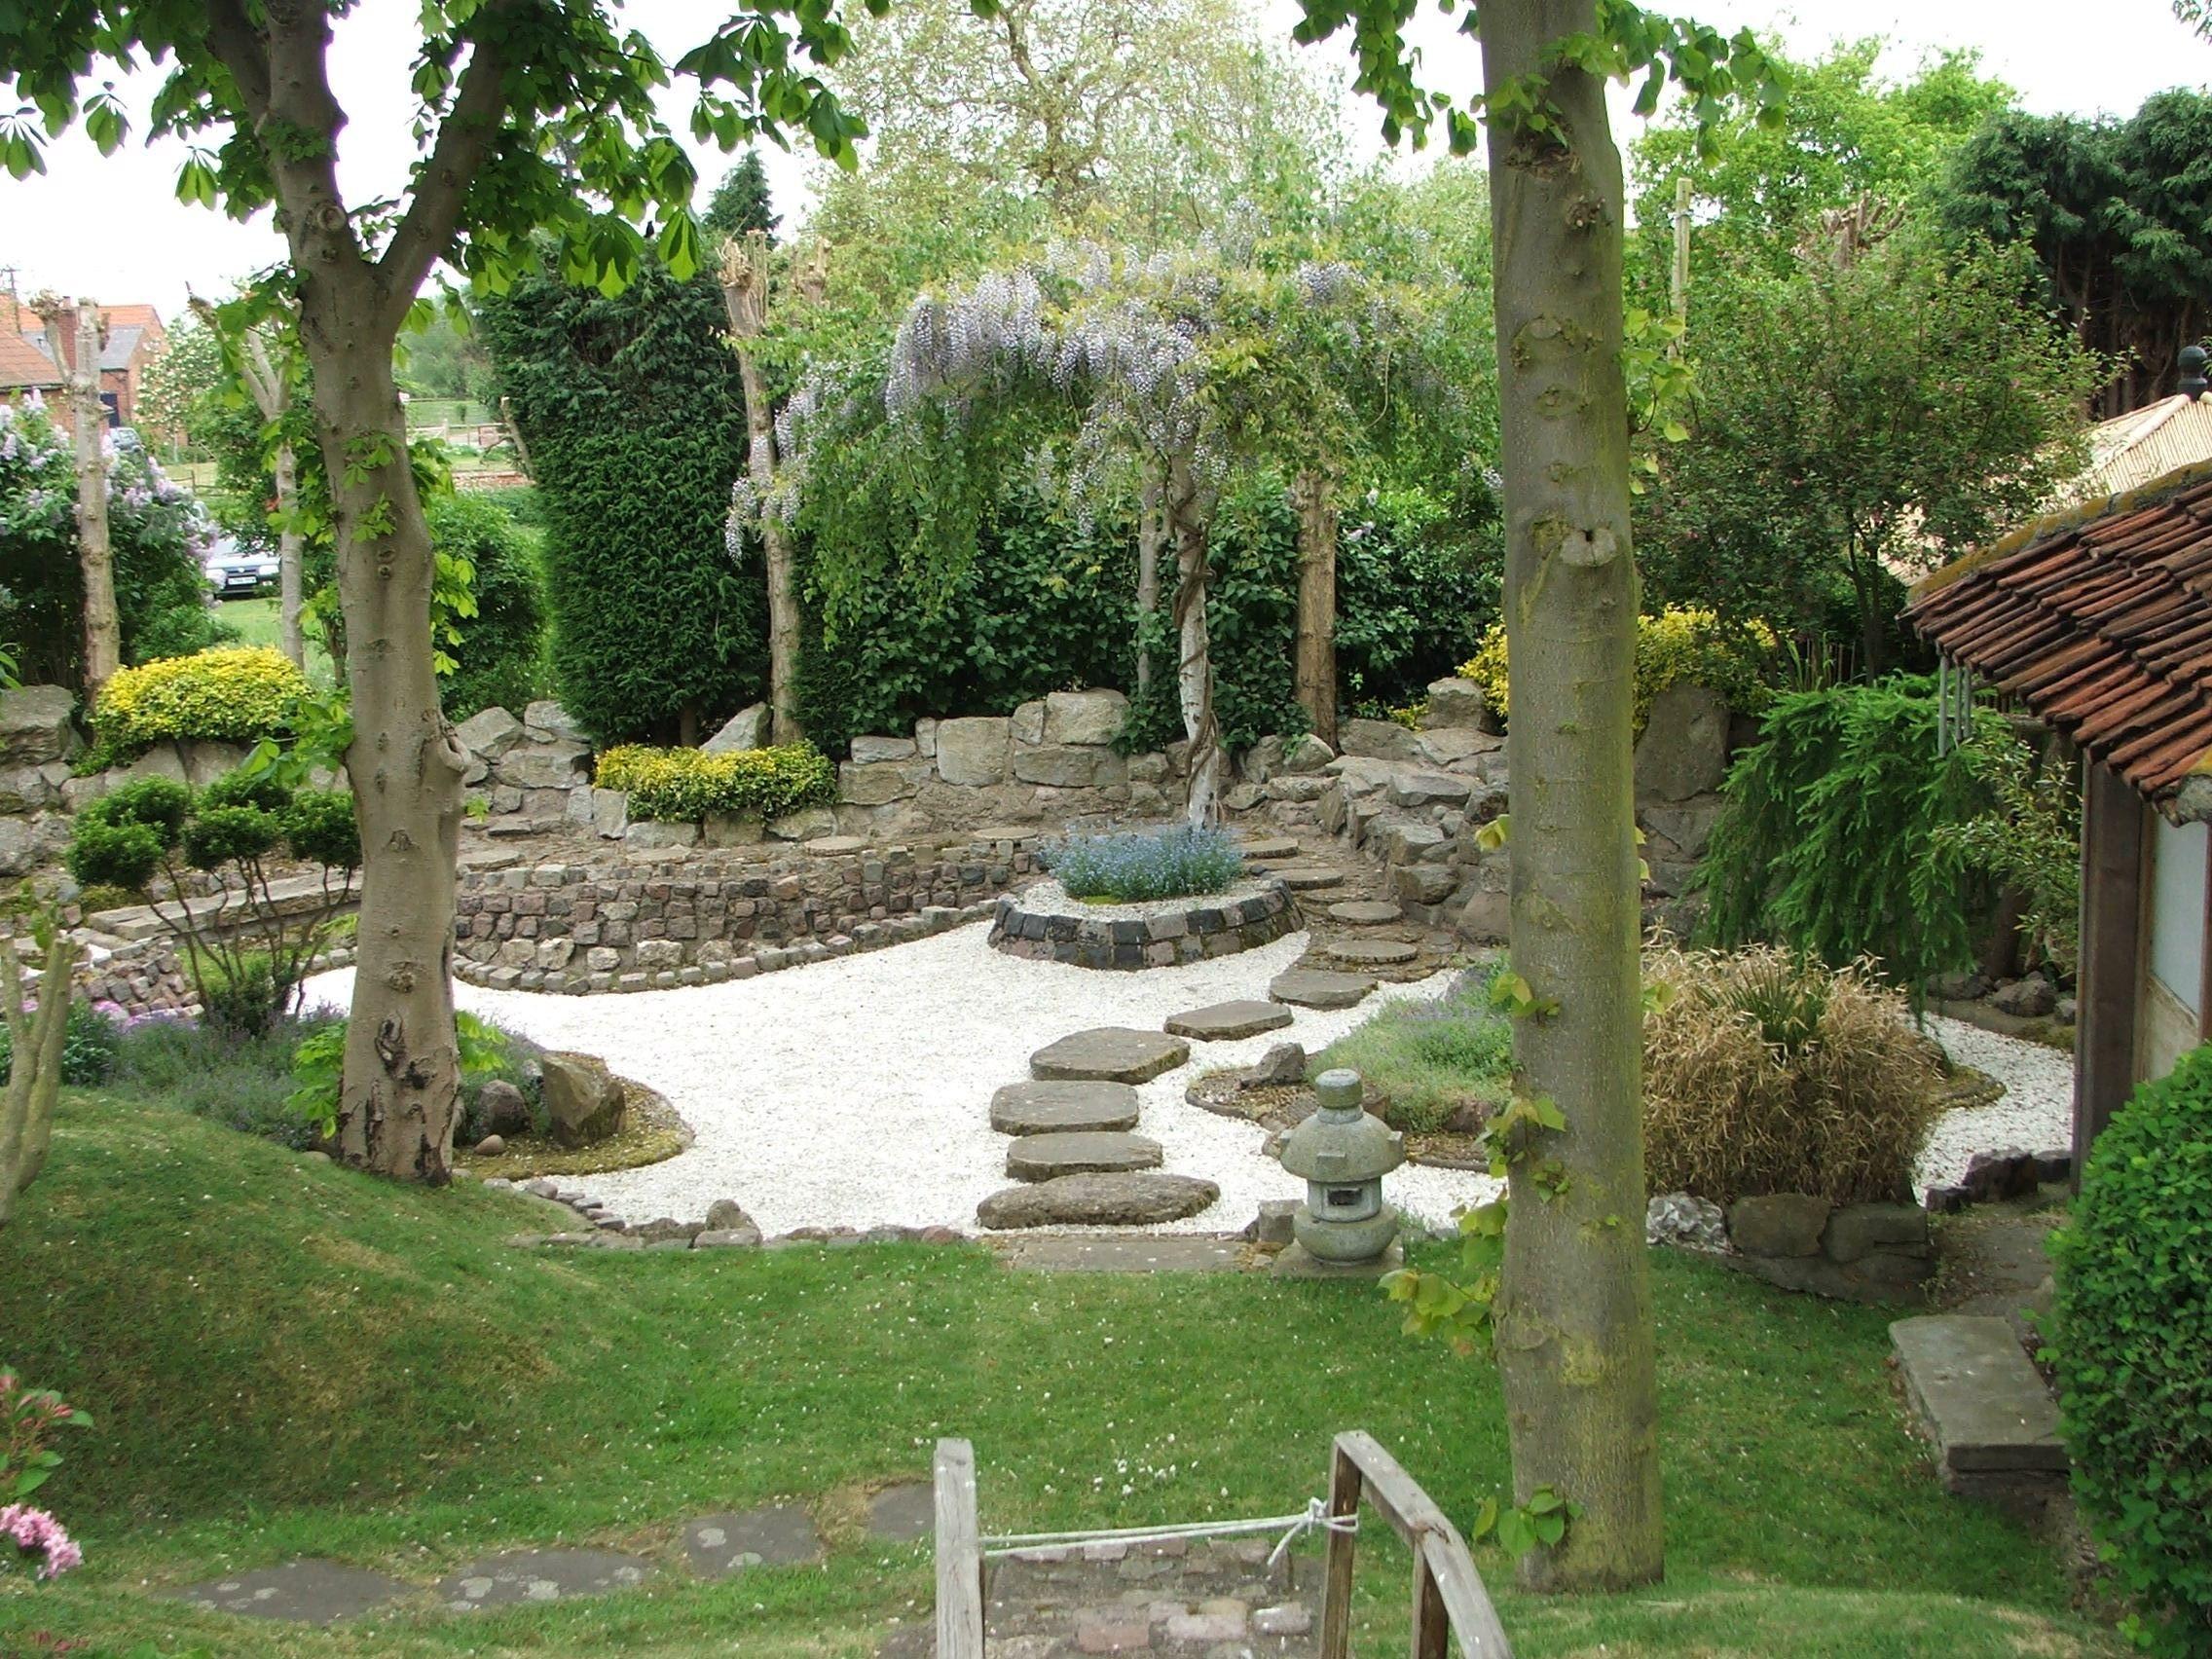 japonese garden source of inspiration architecture plants